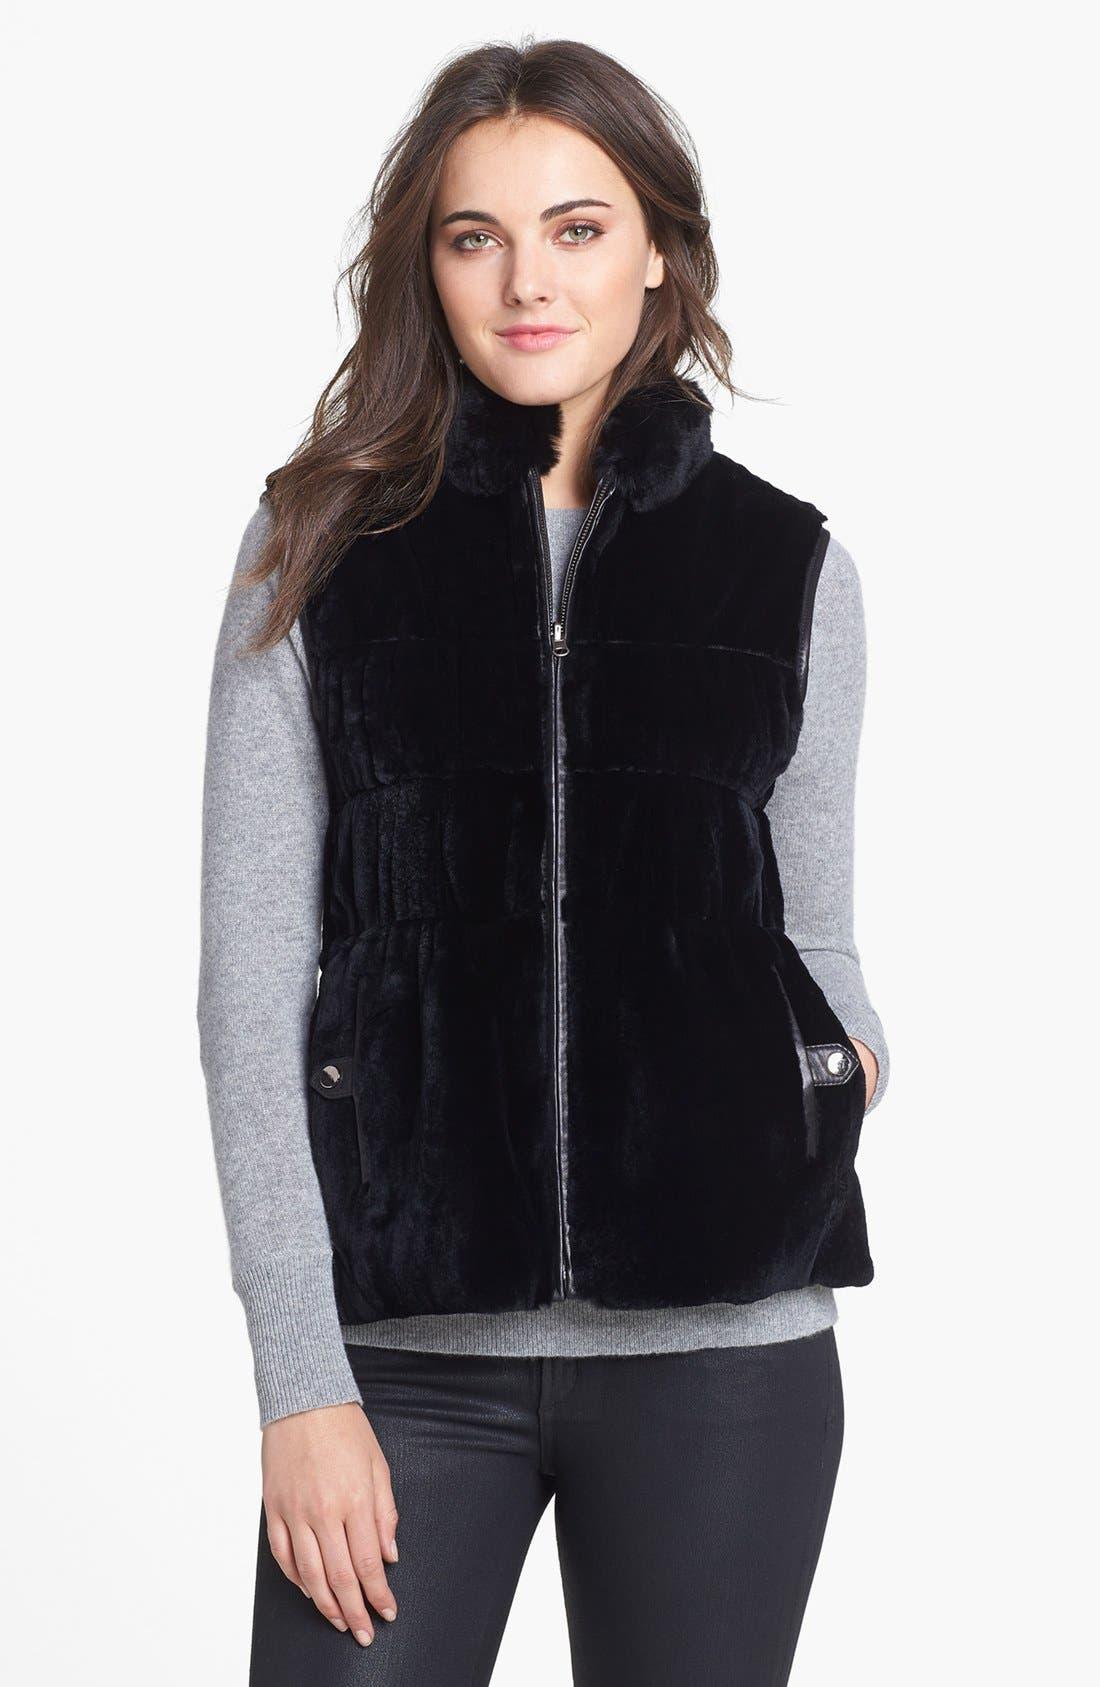 Alternate Image 1 Selected - Chosen Furs Reversible Rabbit Fur & Lambskin Leather Vest